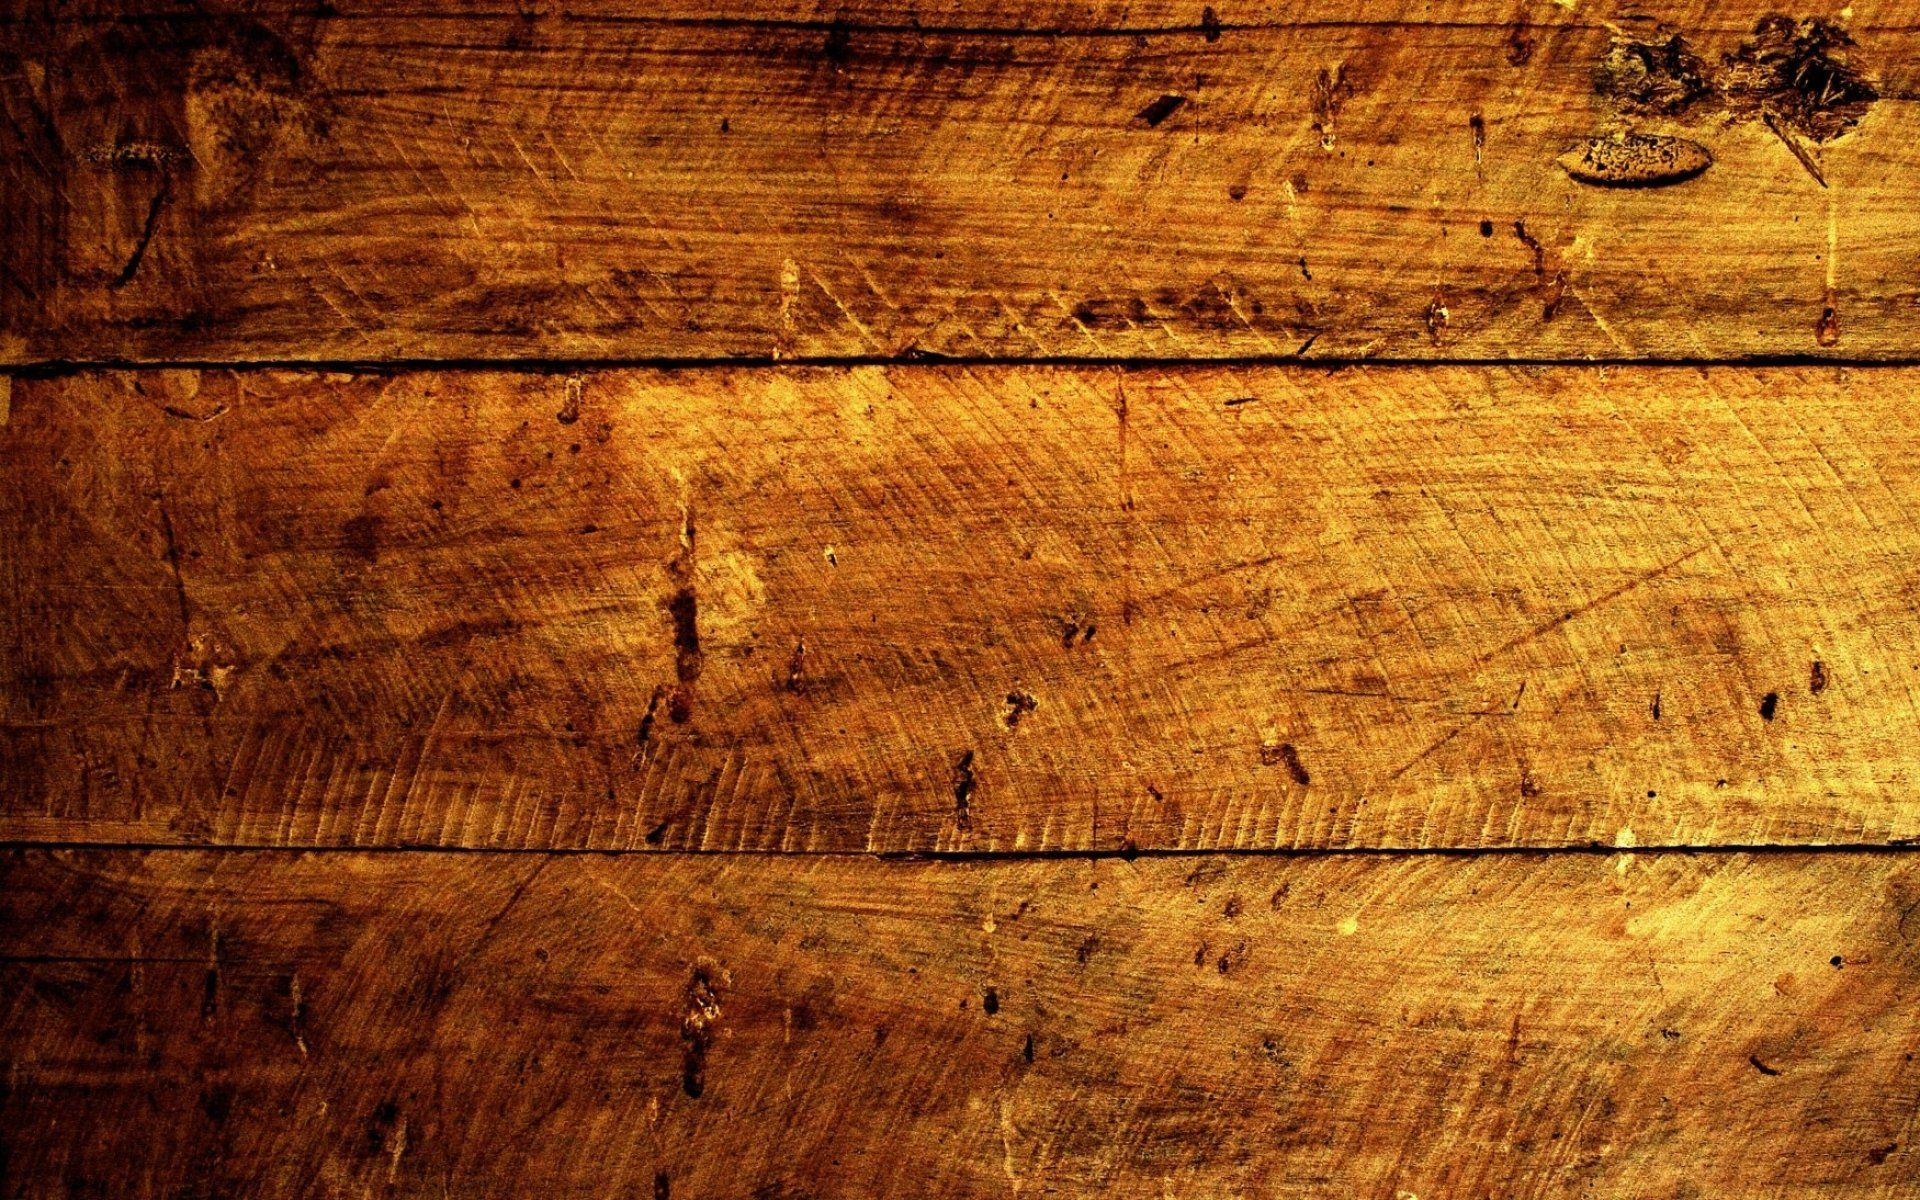 High Res Wood Texture Wallpaper Walldevil Best Free Hd Desktop Zone